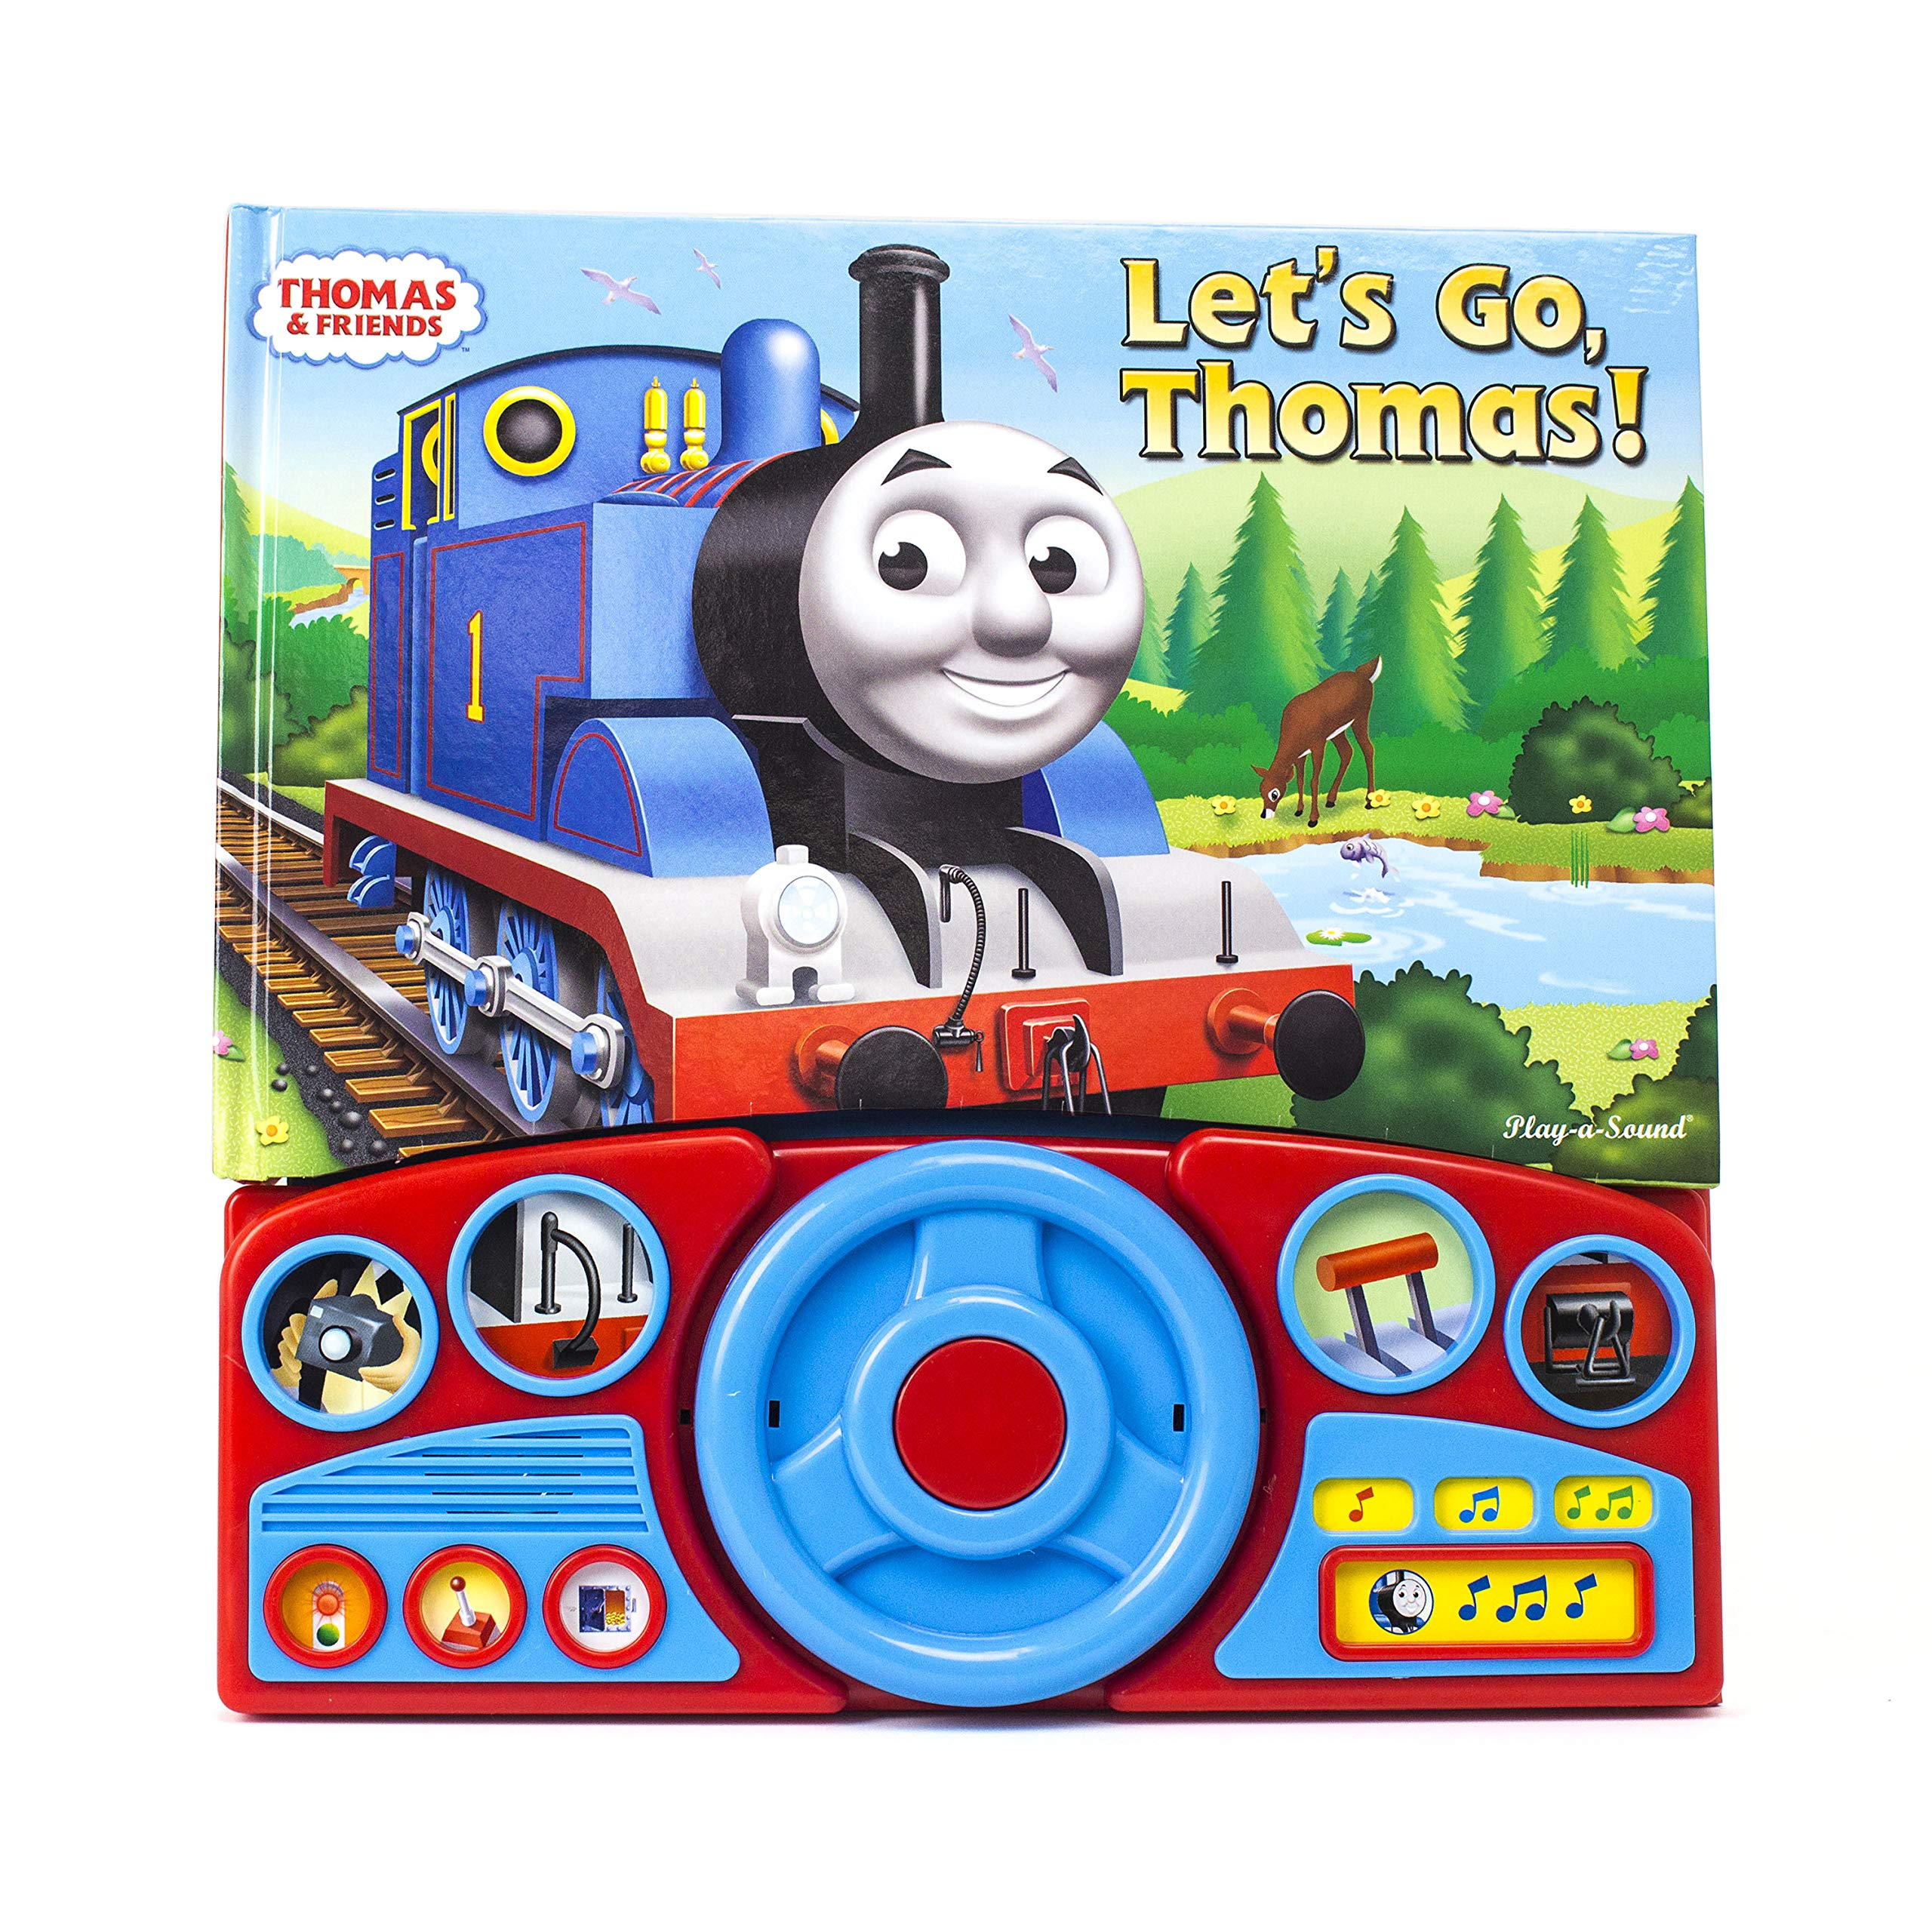 Amazon com: Thomas & Friends - Let's Go Thomas! Interactive